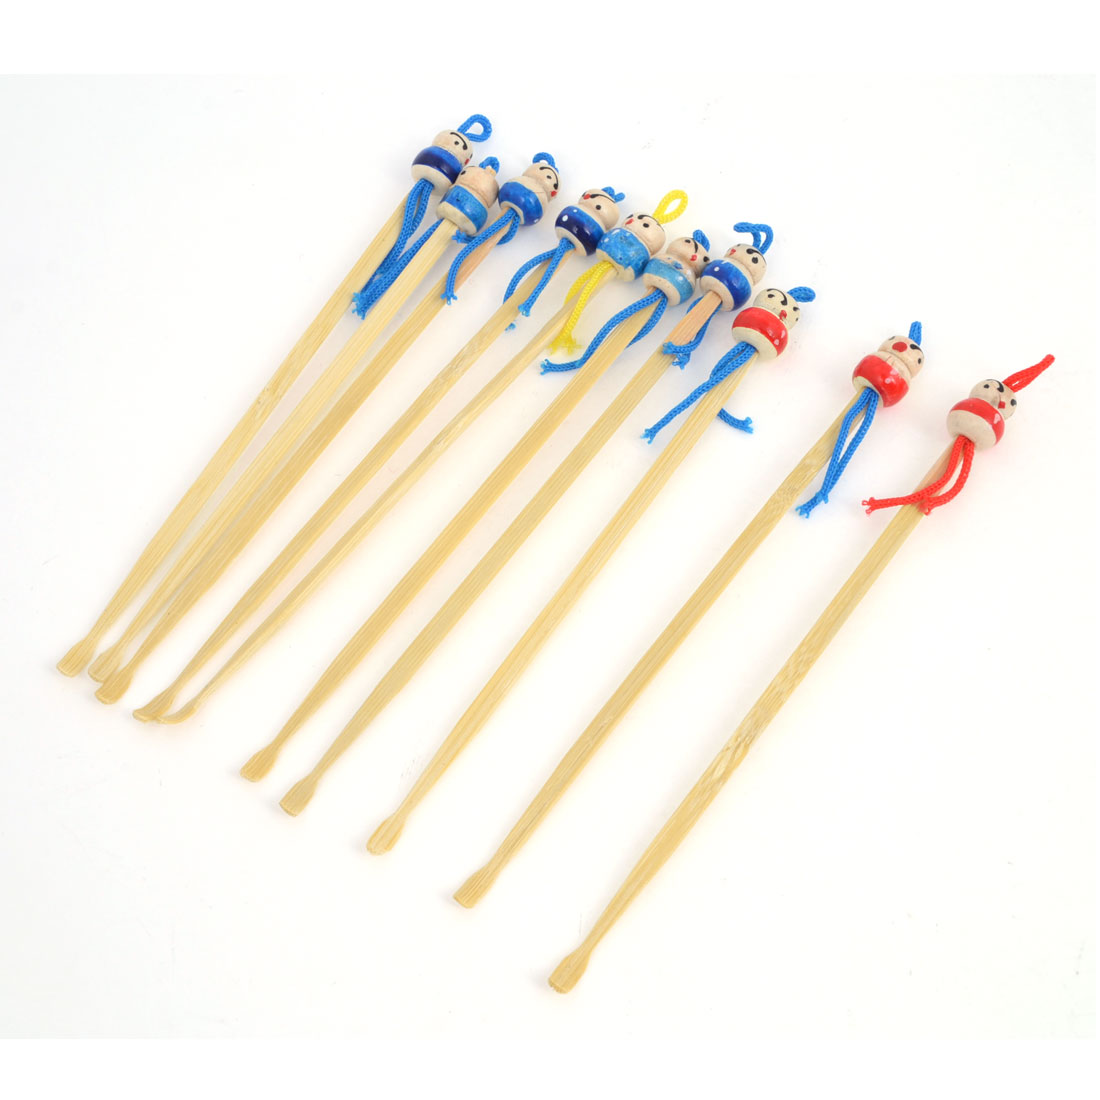 Unique Bargains Bamboo Ear Pick Spoon Curette Ear Wax Remover Cartoon Doll Decor 10 Pcs